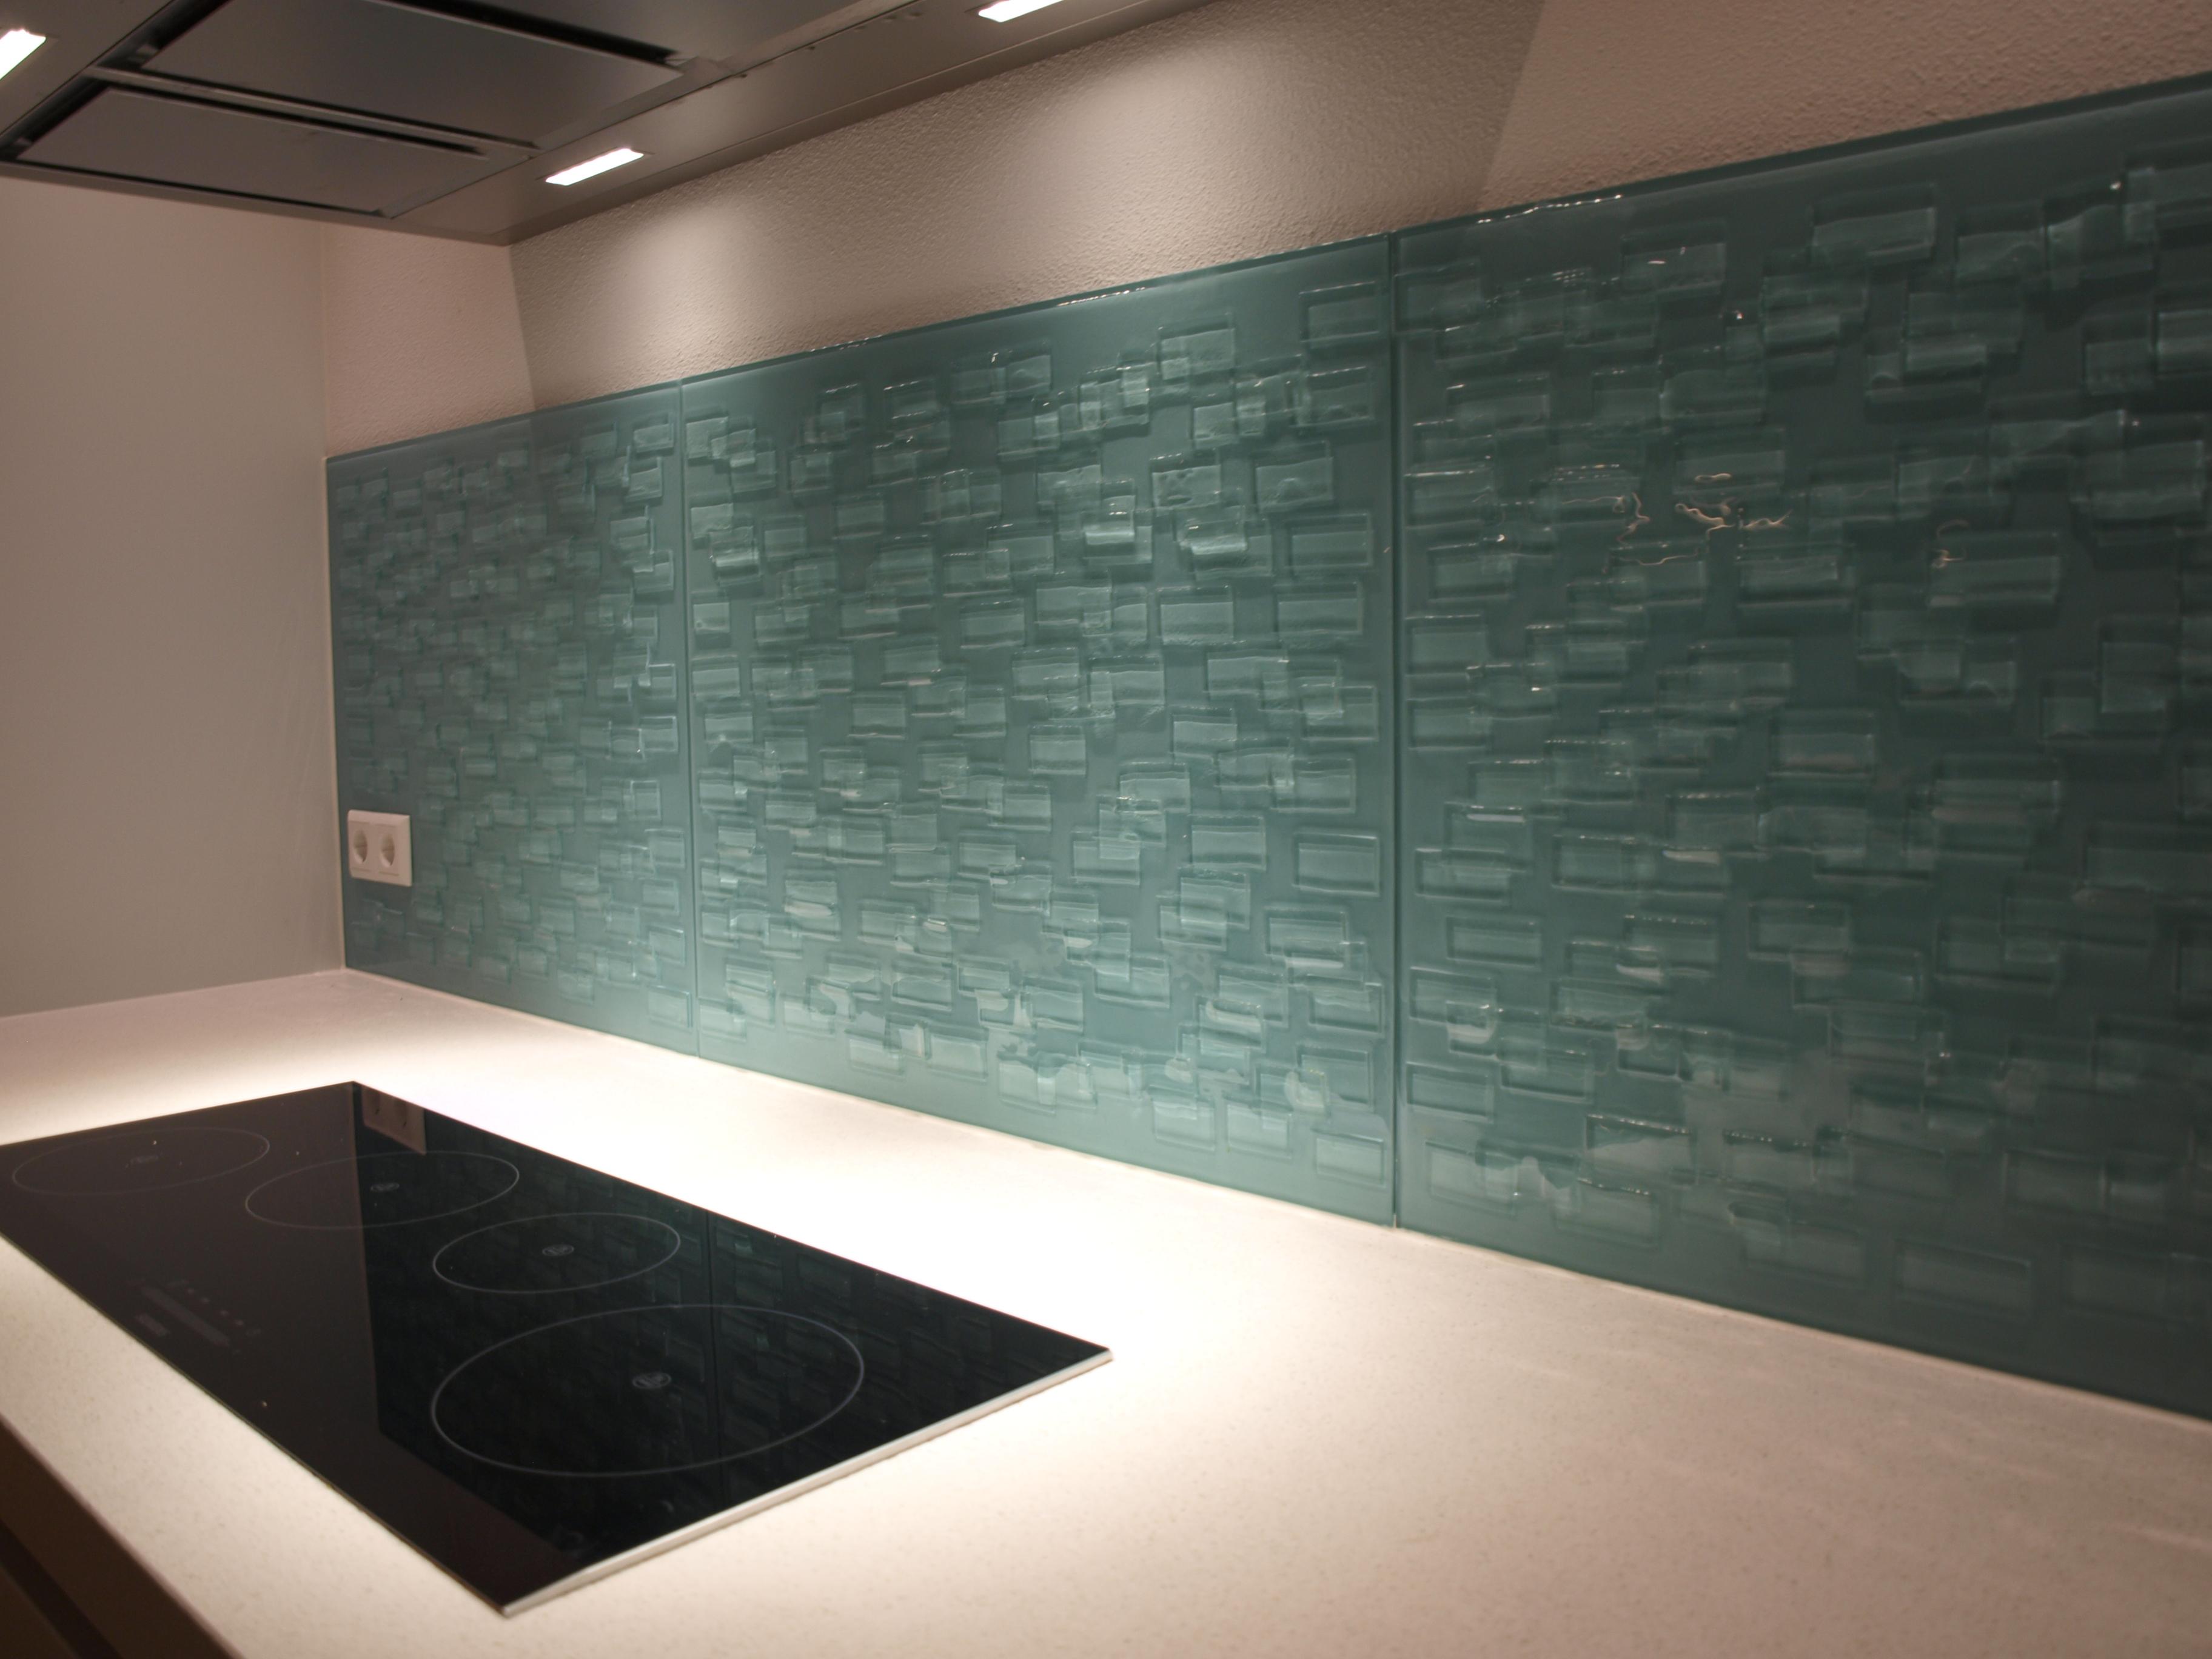 Keuken achterwand glas in Amsterdam geplaatst